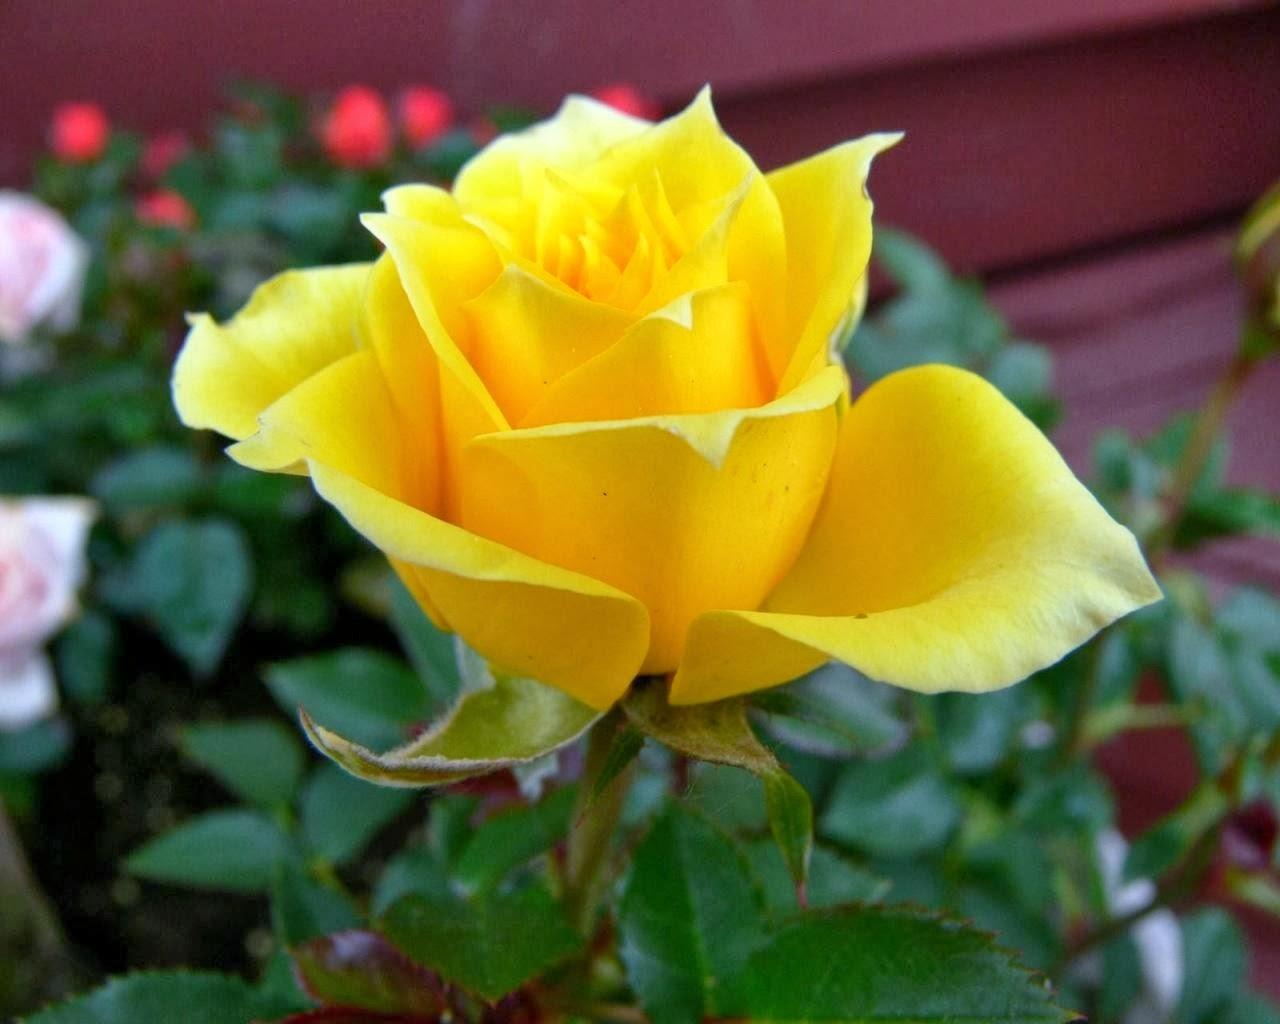 One Yellow Rose